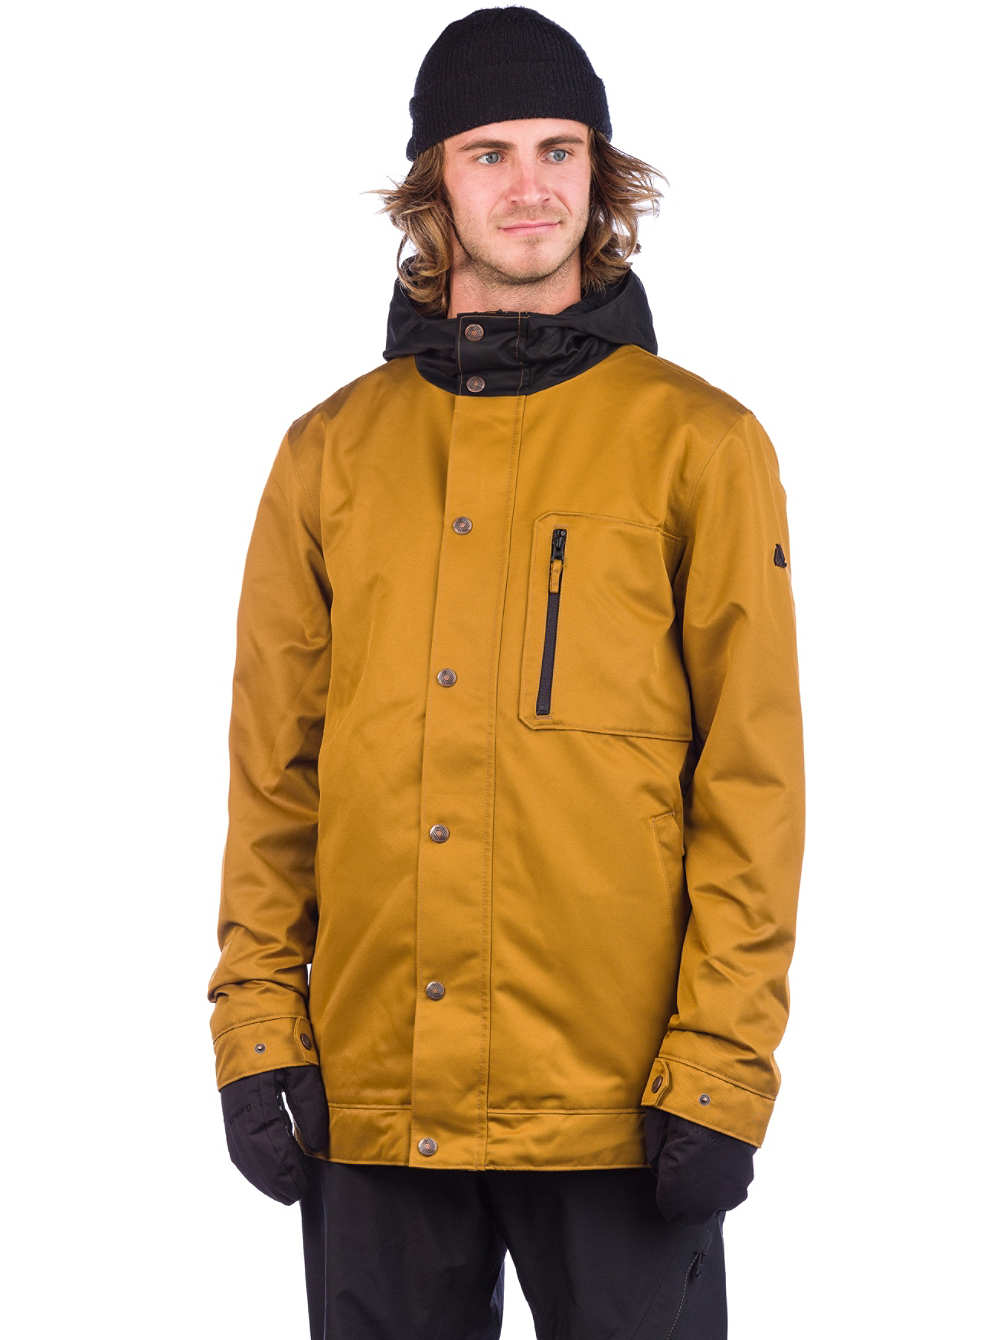 Aperture-Stratus-Jacket